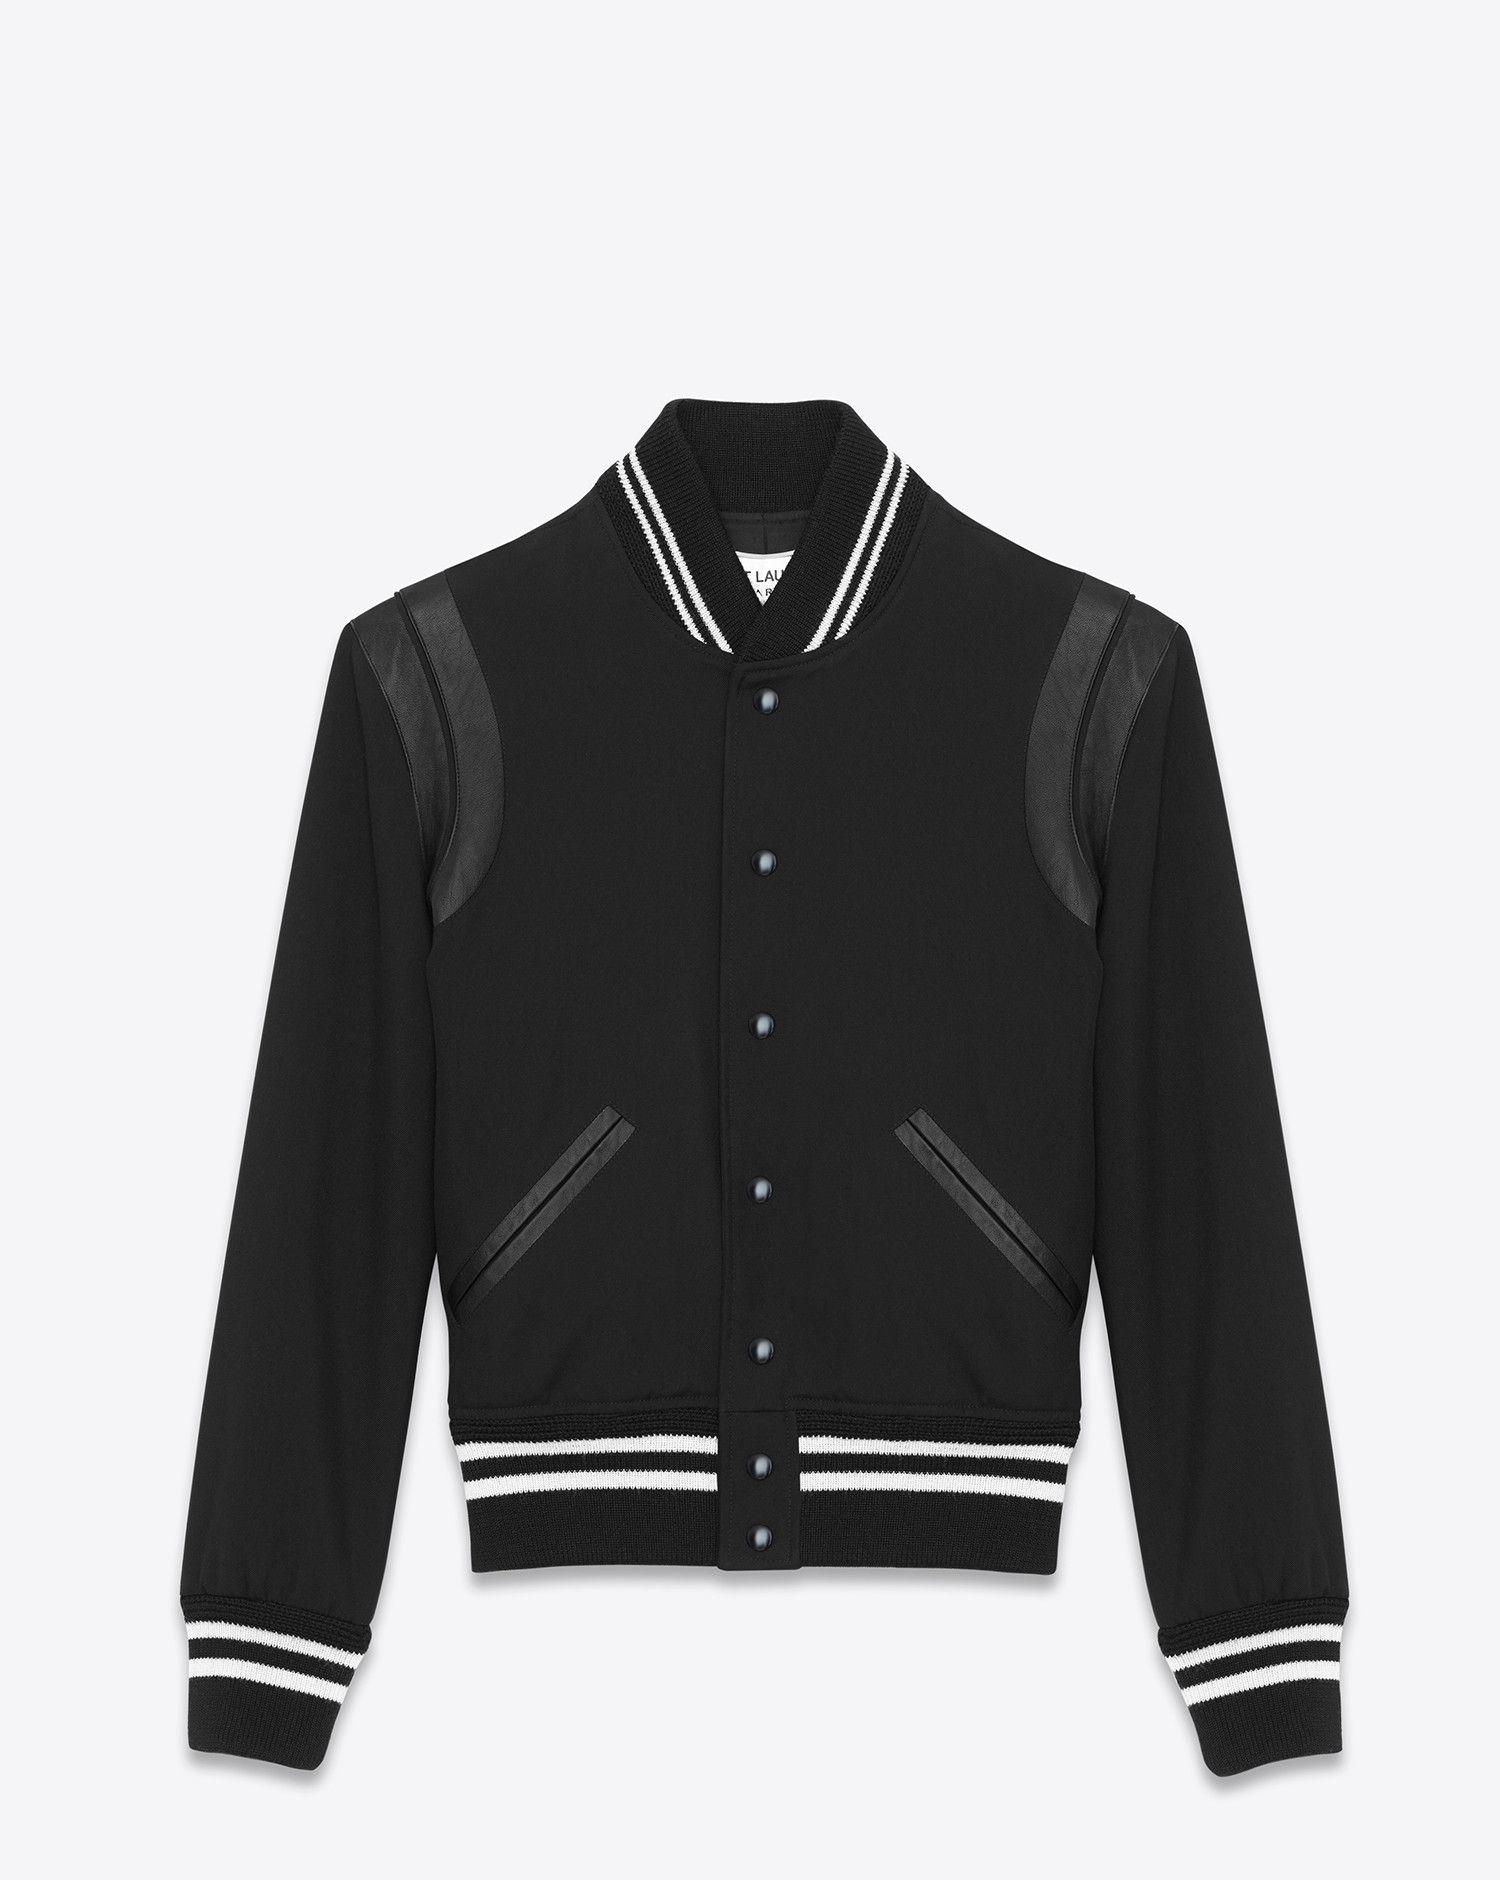 Saint Laurent Teddy Jacket In Black Gabardine And Black Leather Ysl Com Teddy Jacket Mens Outdoor Jackets Varsity Bomber Jacket [ 1880 x 1500 Pixel ]